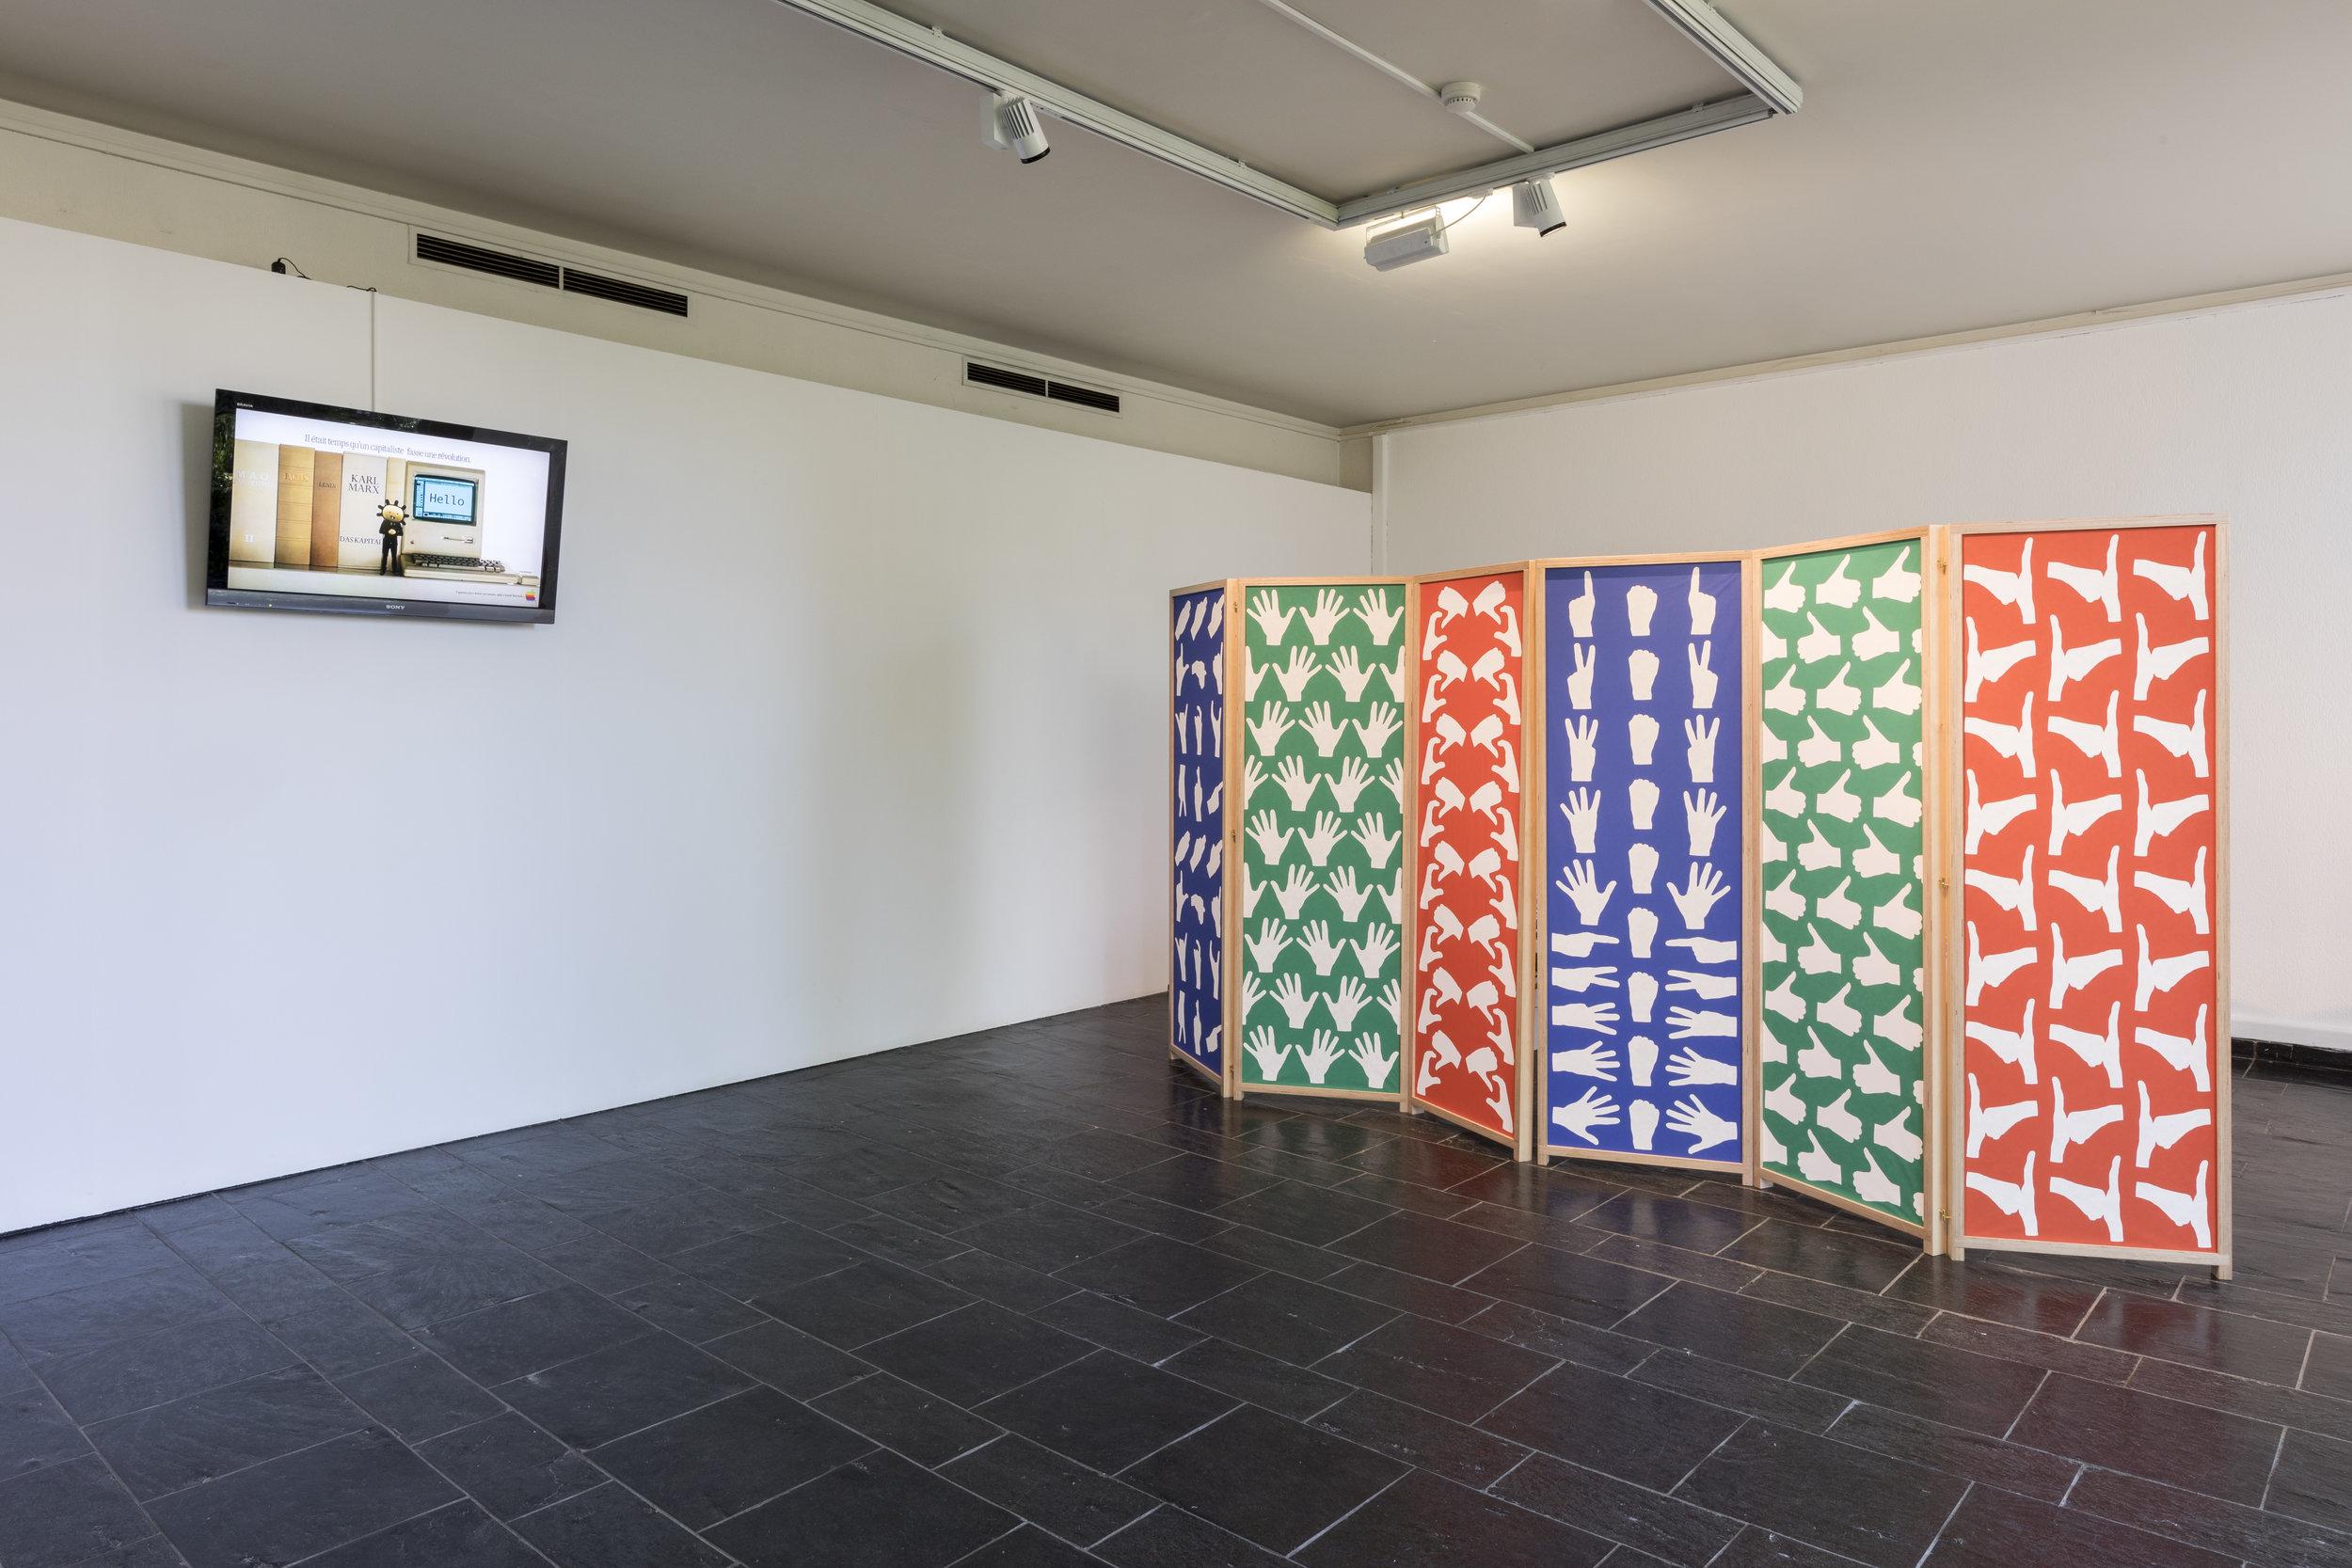 Installation view at Musée d'Ixelles, Brussels © Vincent Everaerts